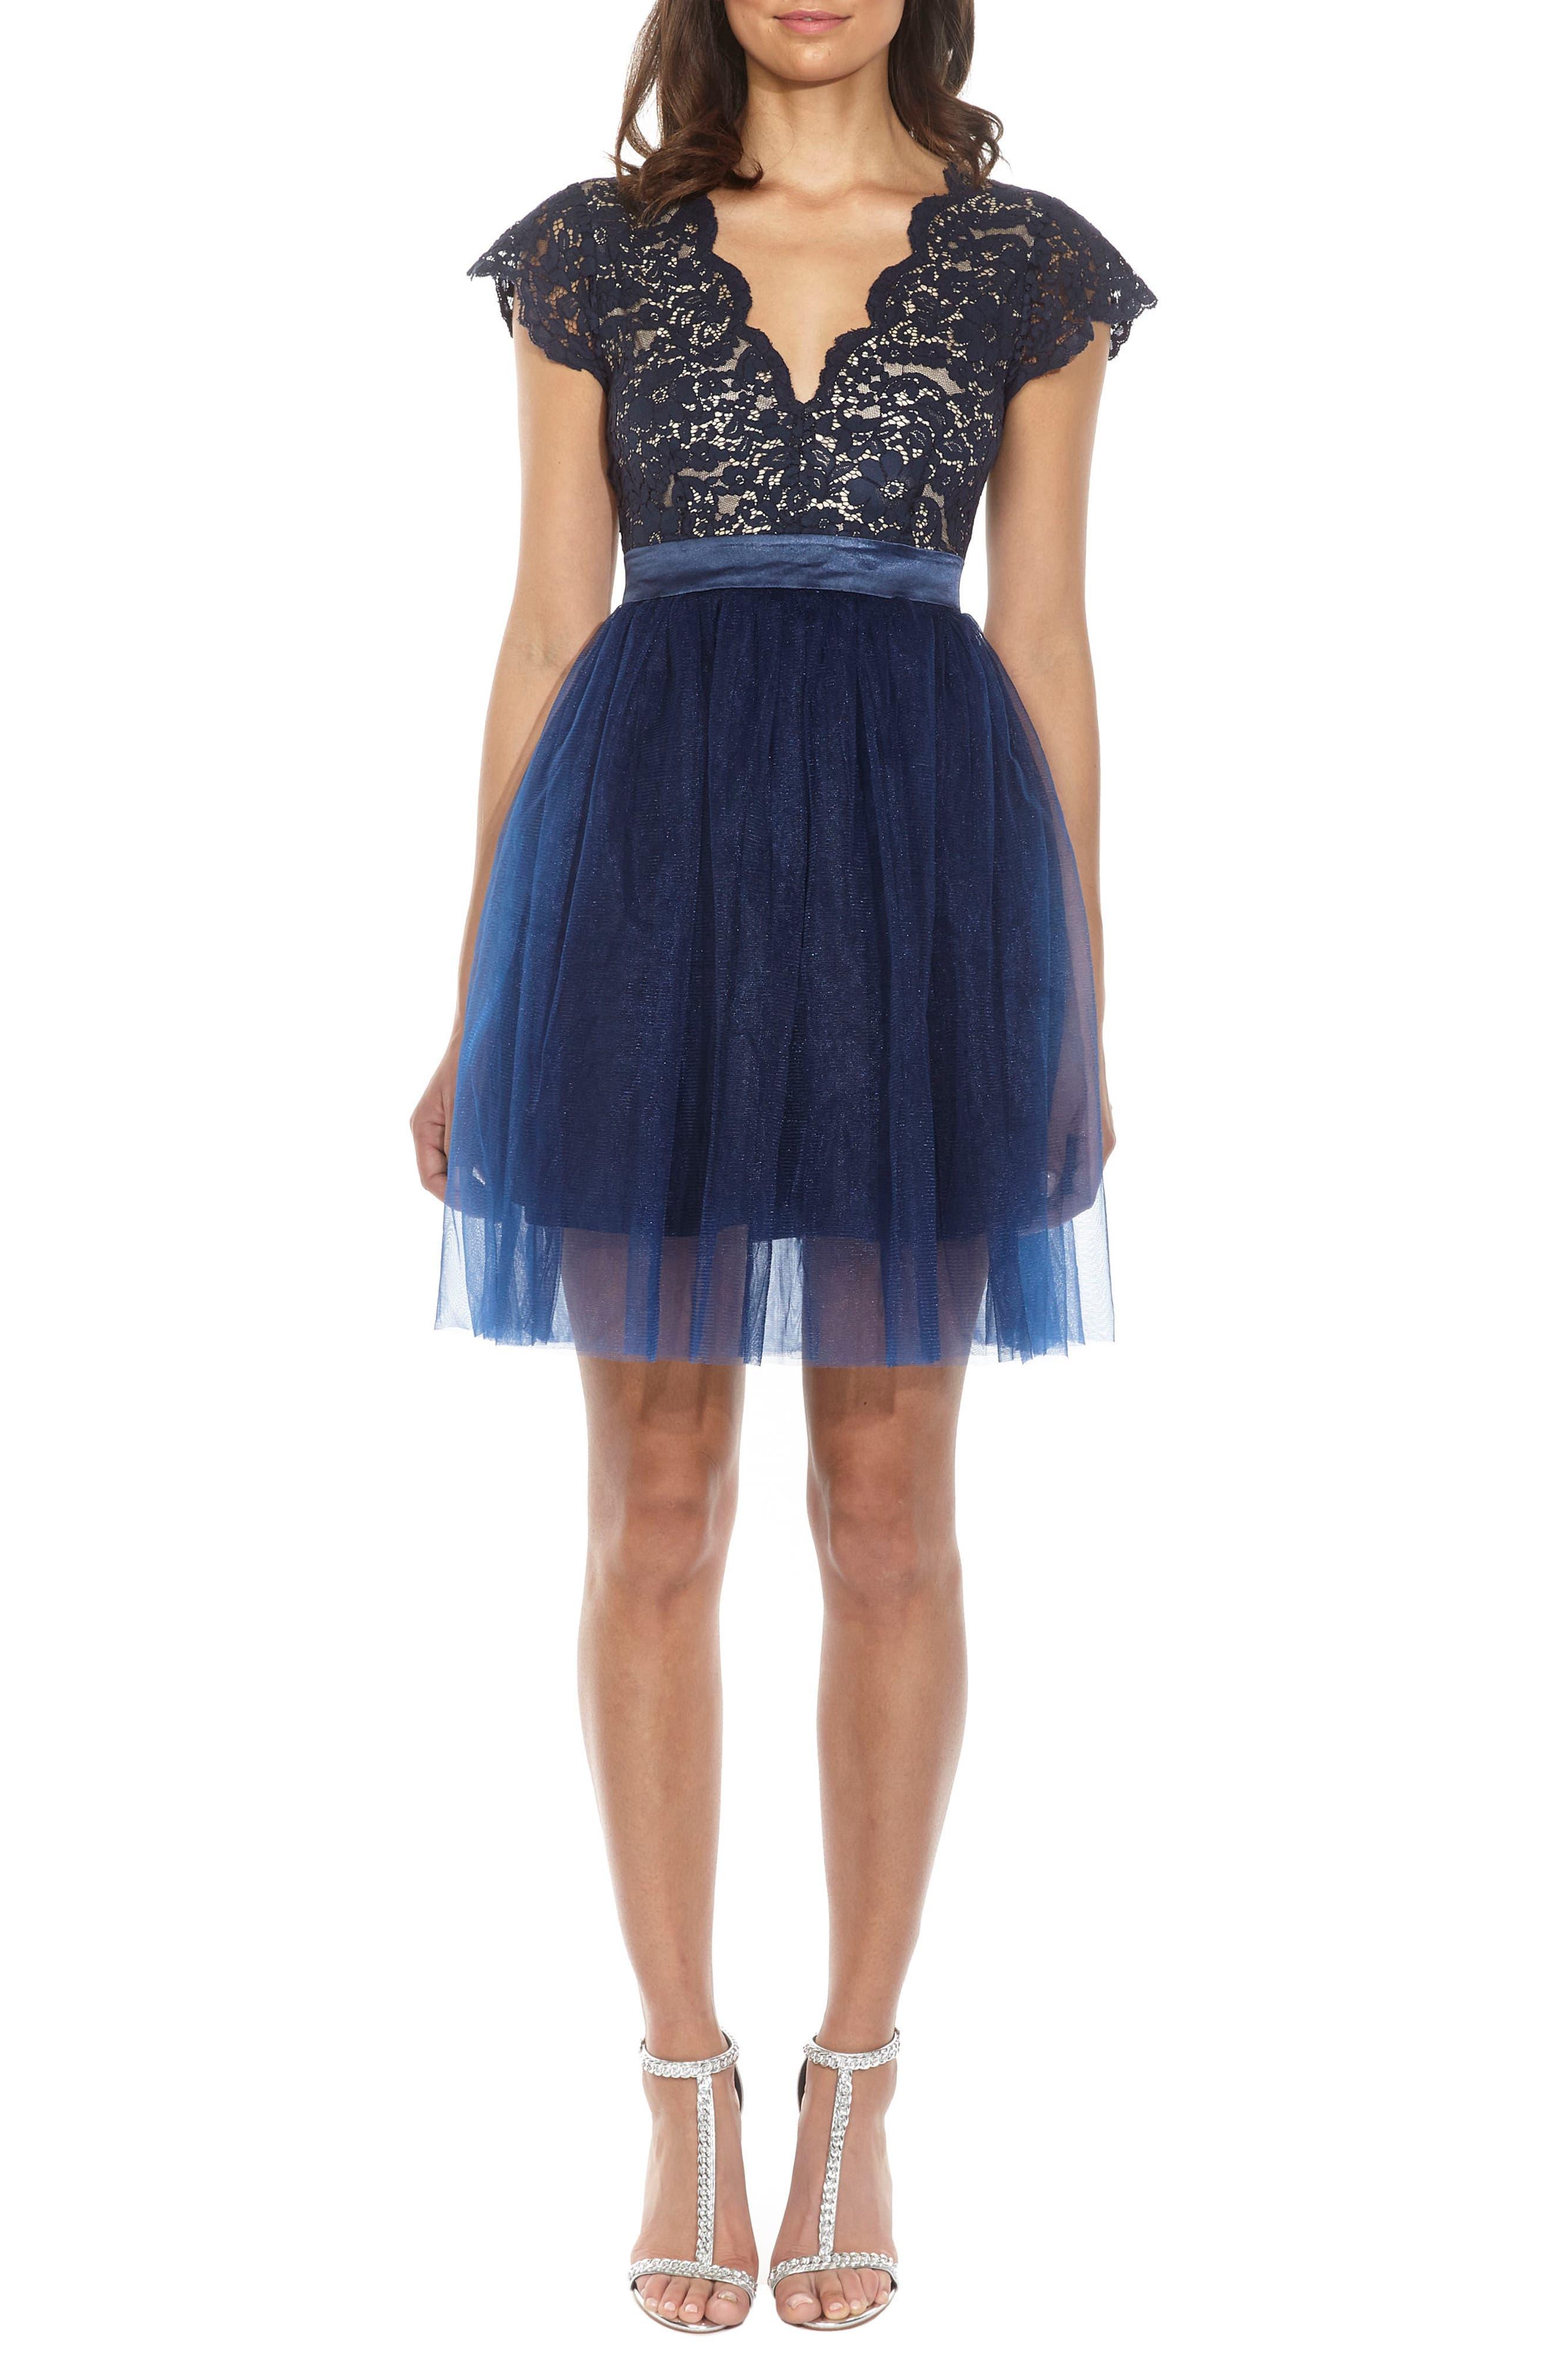 Macen Scalloped Lace Skater Dress,                             Alternate thumbnail 2, color,                             Navy